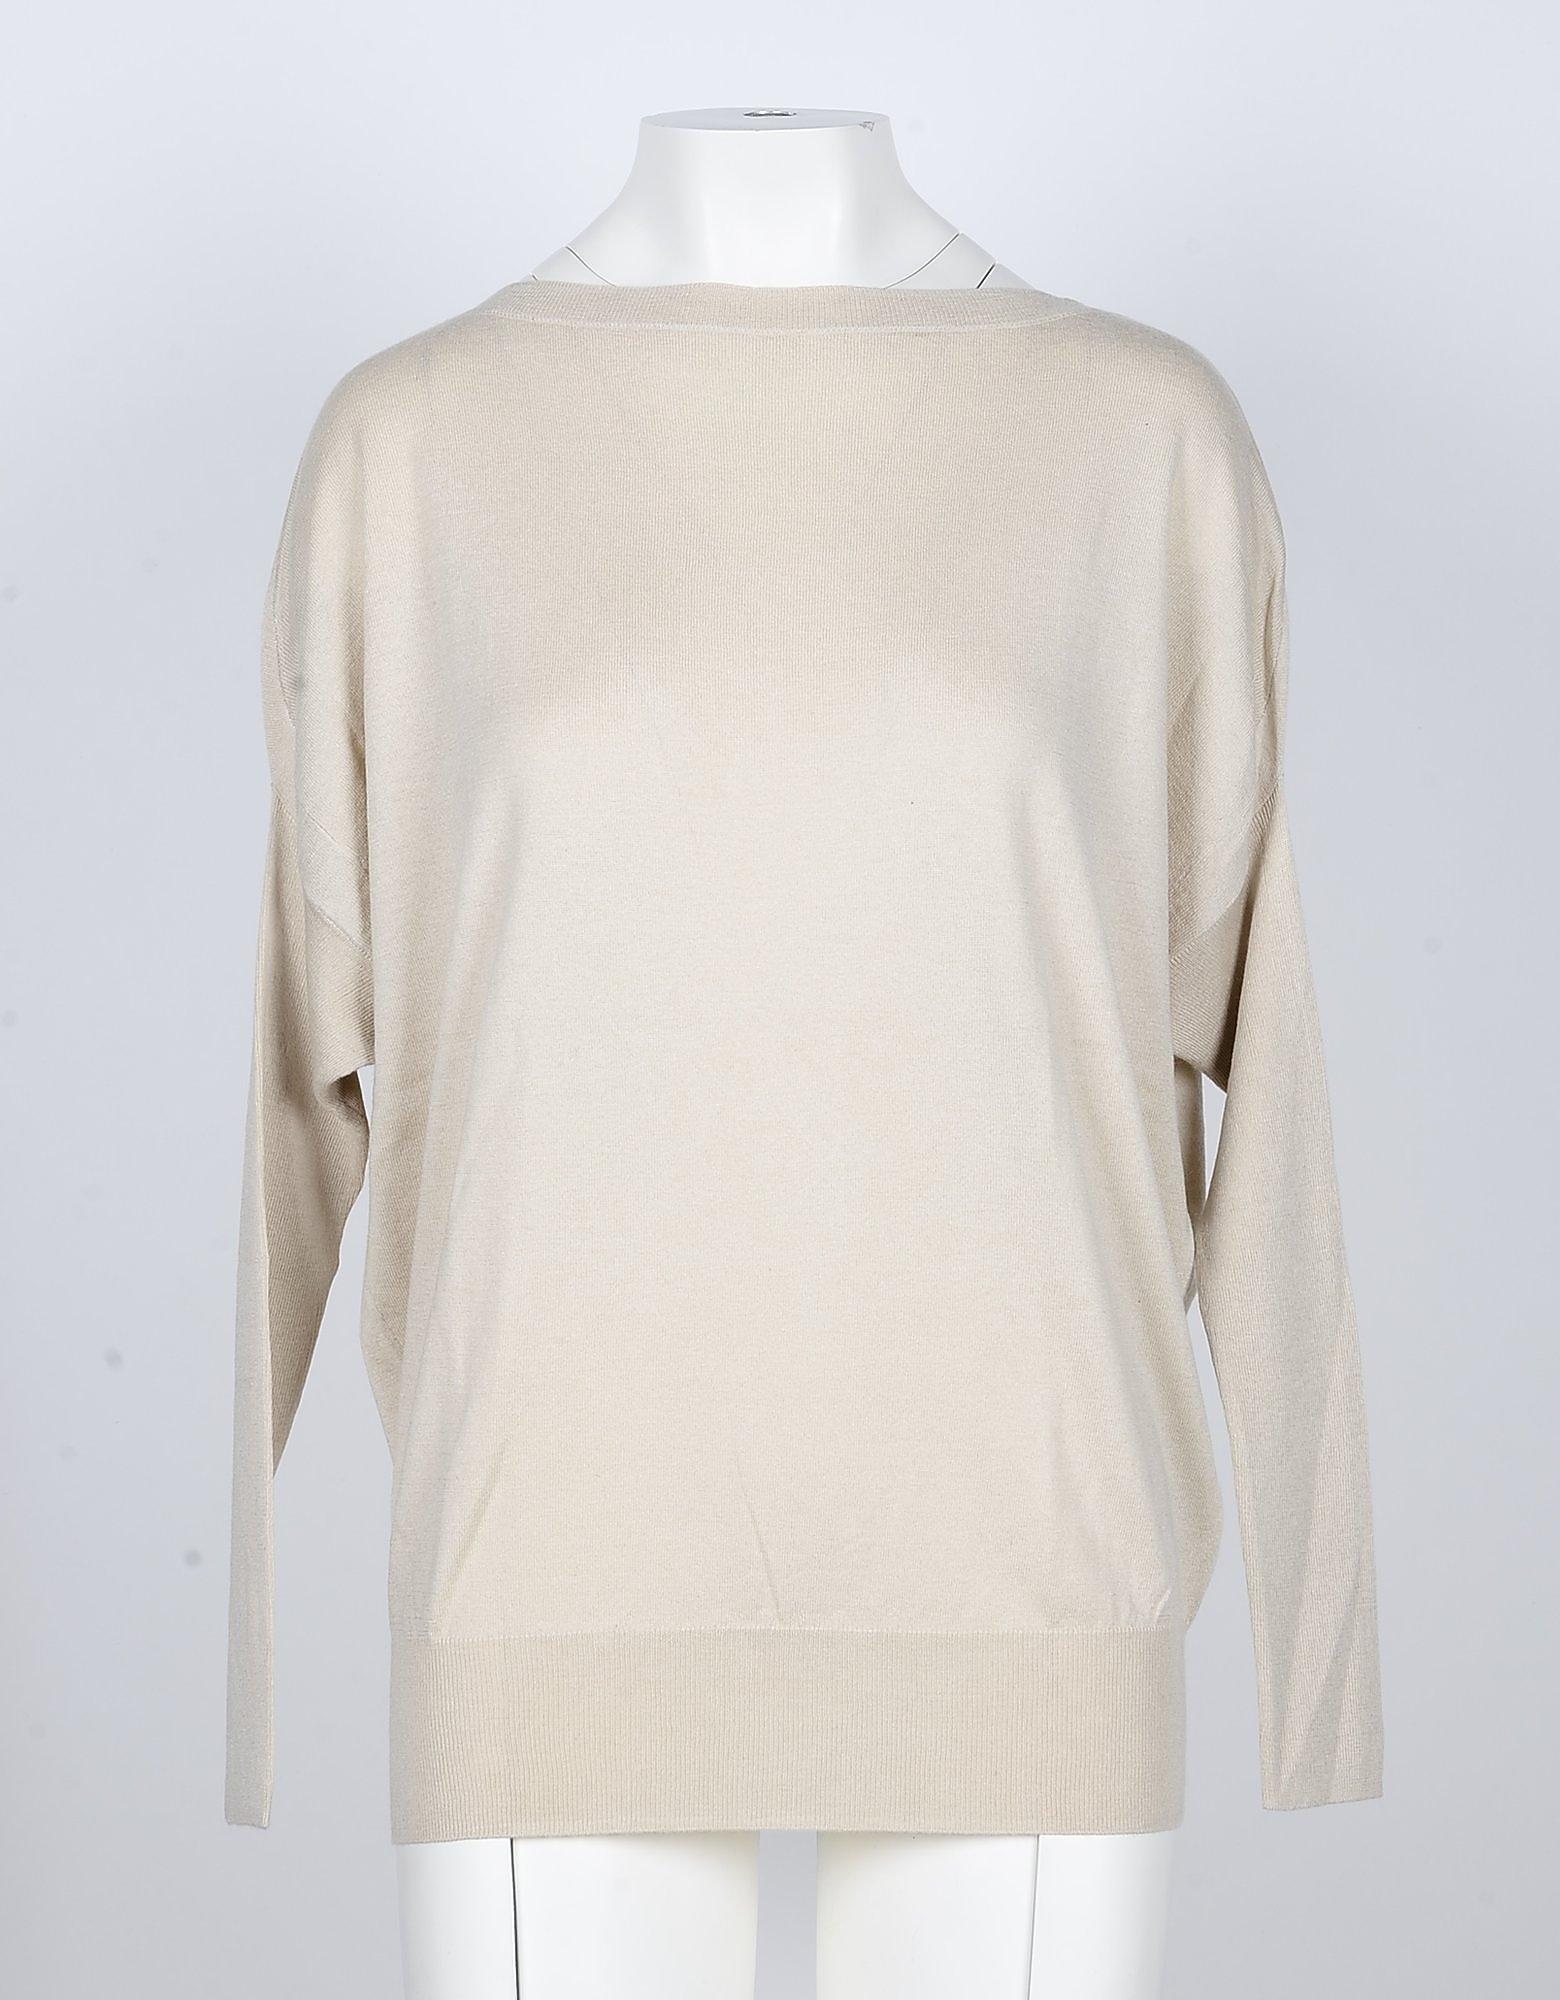 SNOBBY SHEEP Designer Knitwear, Beige Silk and Cashmere Blend Women's Sweater